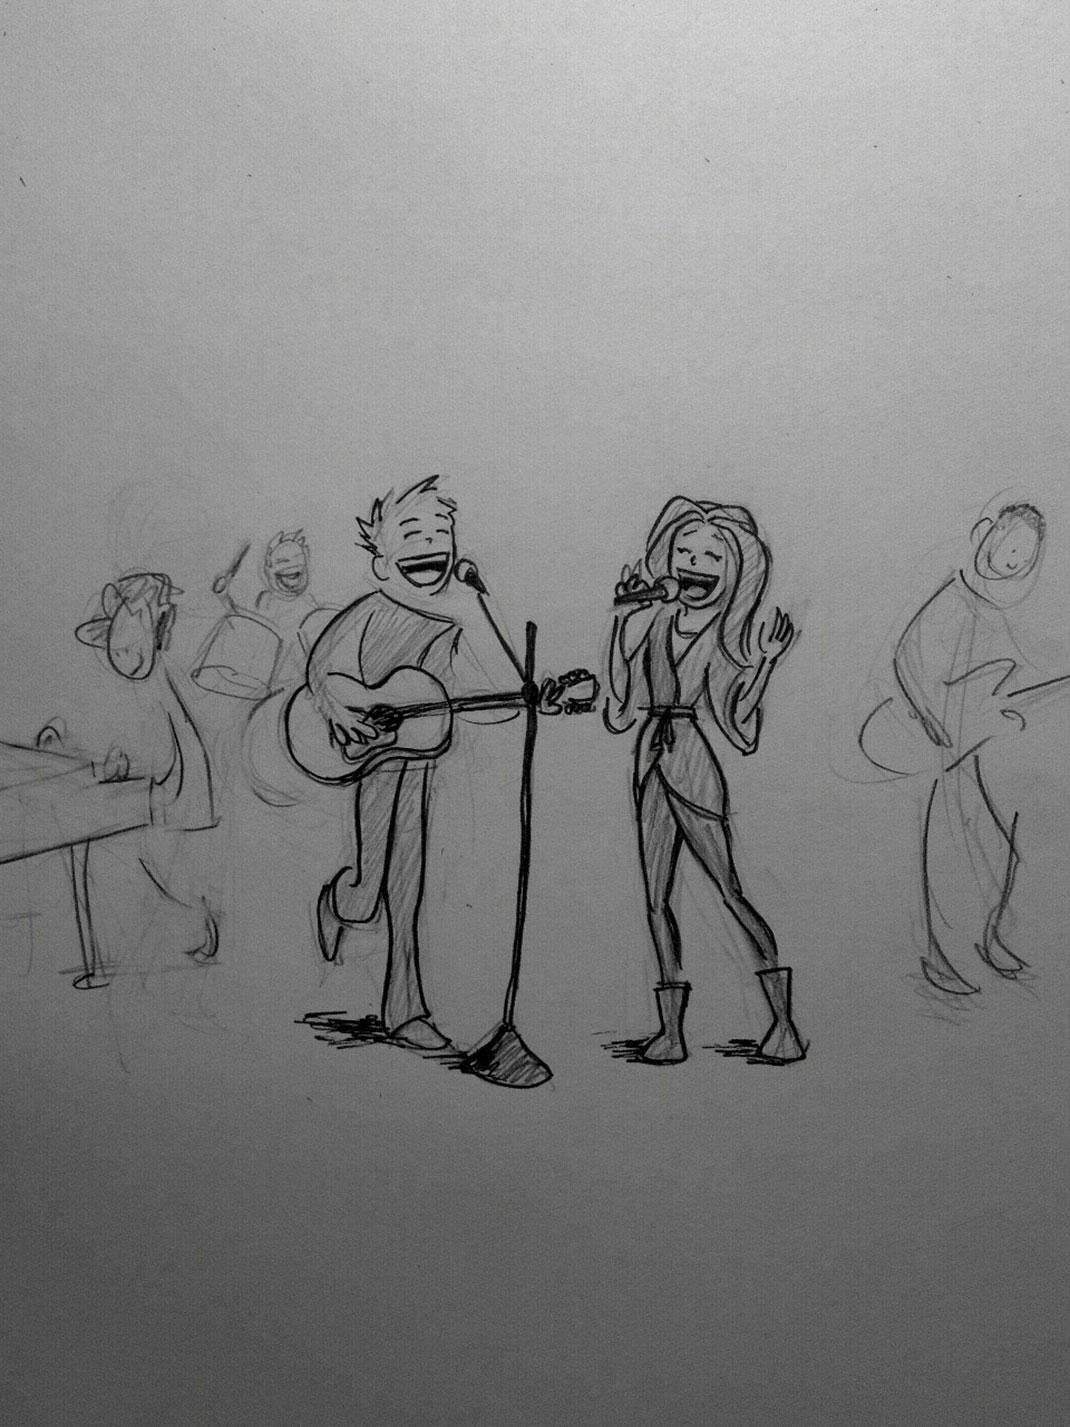 amour-365-jours-illustrations-couple-1